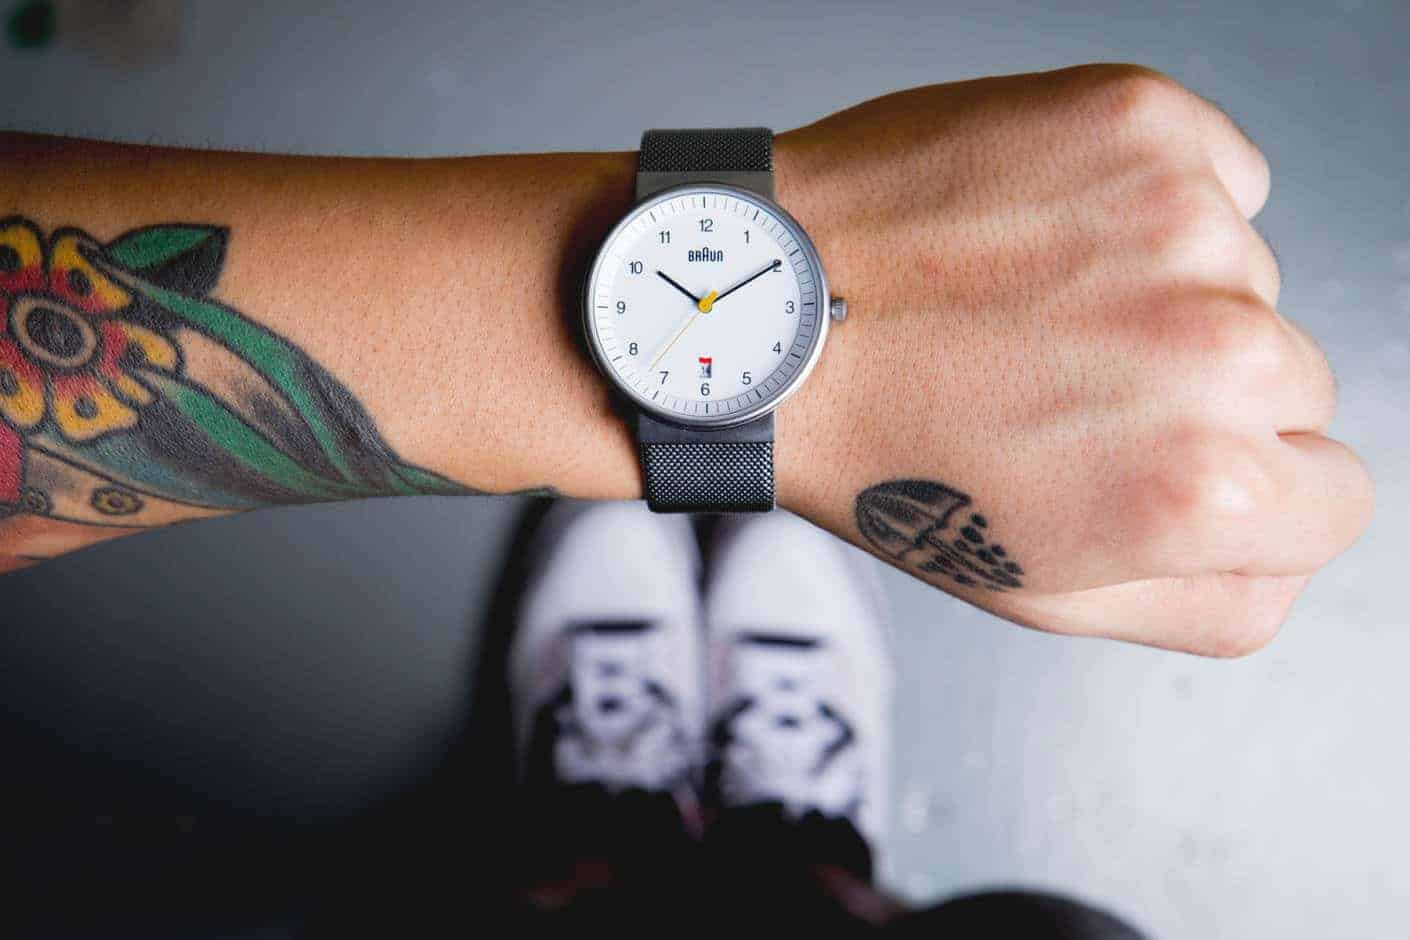 horloge van Braun